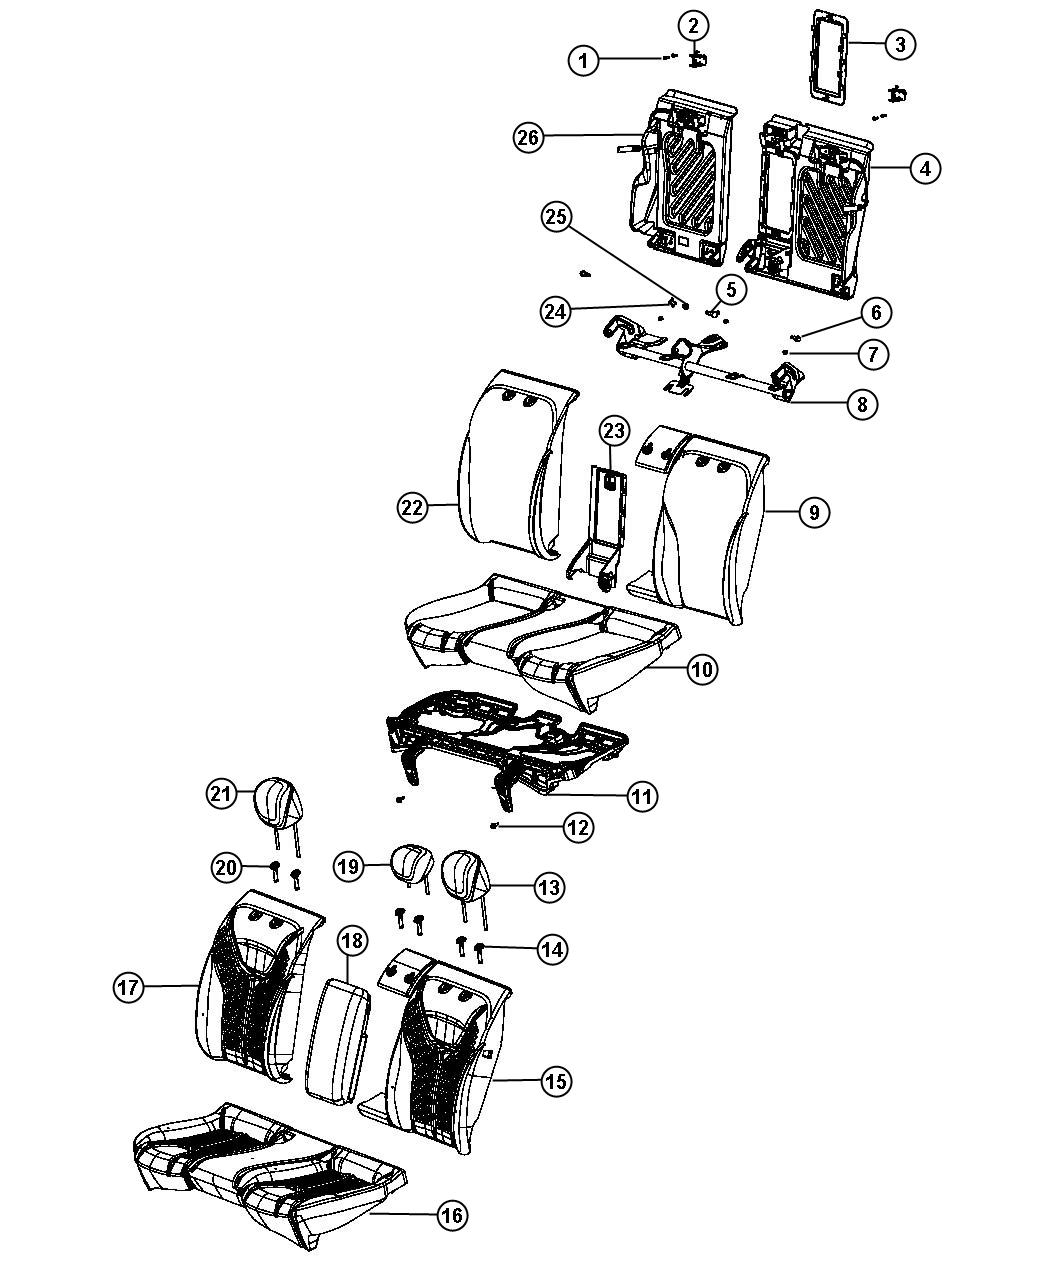 2013 Dodge Dart Cover. Rear seat cushion. Trim: (*g7